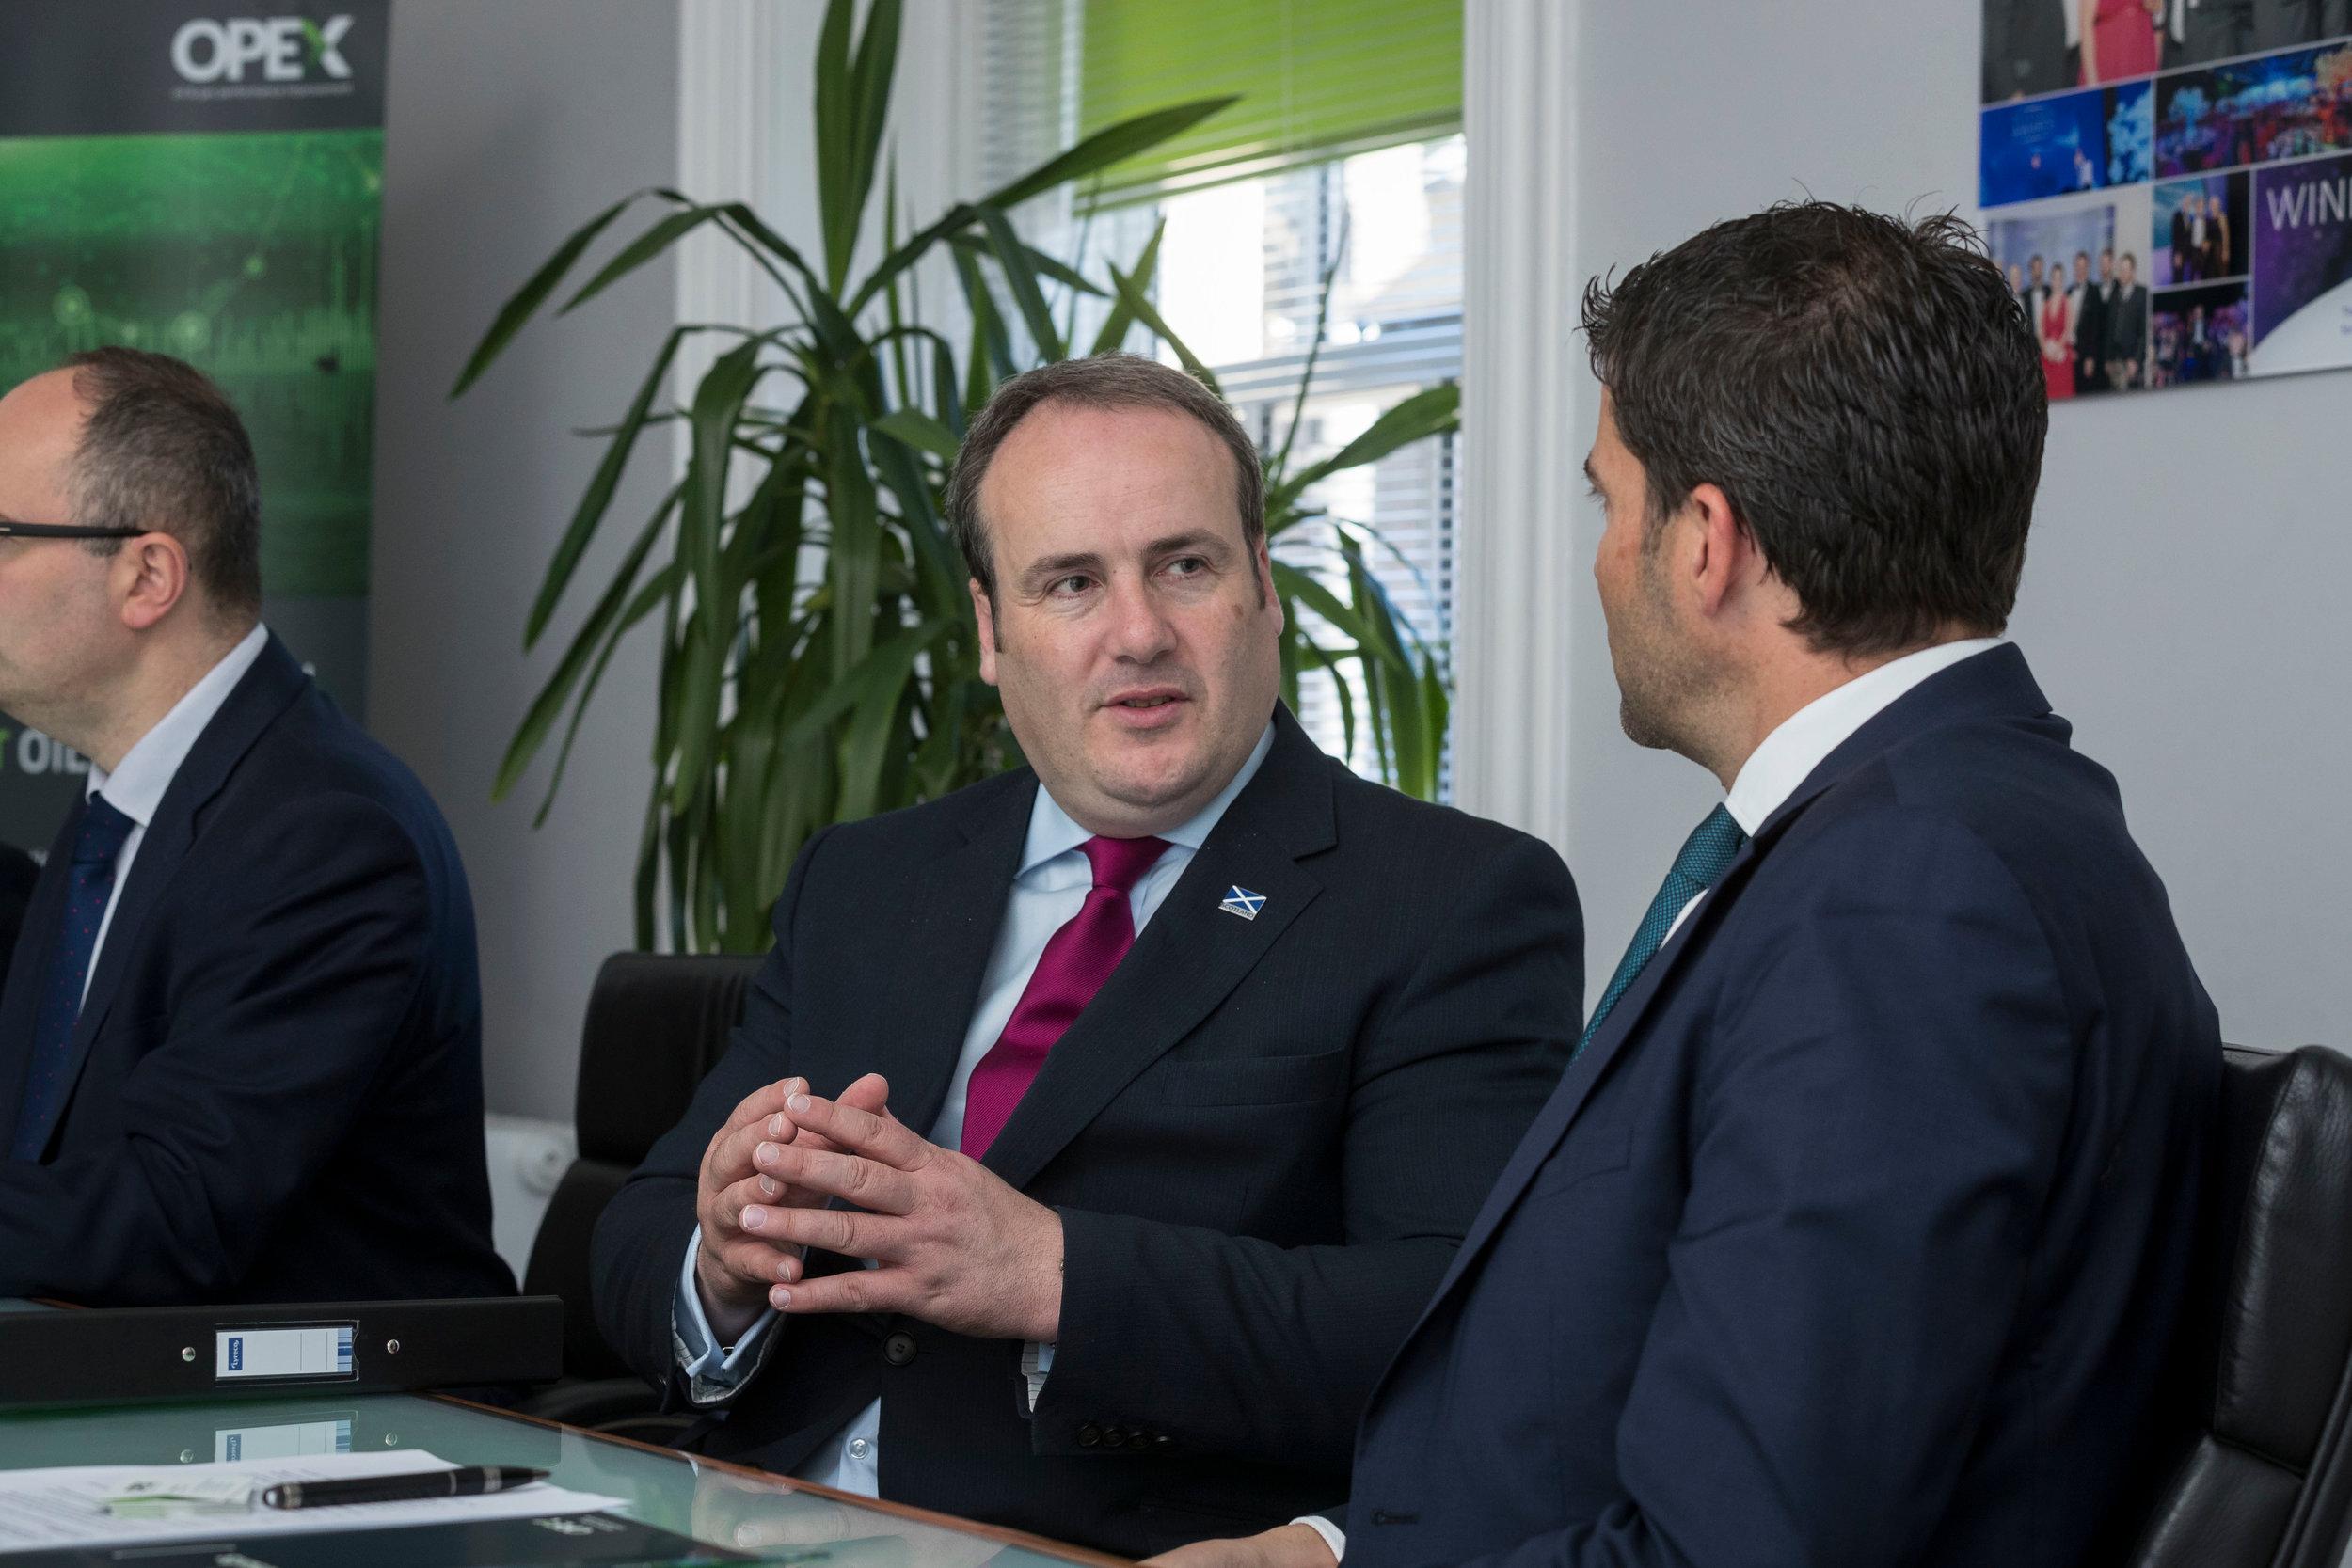 Jamie Bennett, CEO, briefs Scottish Energy Minister